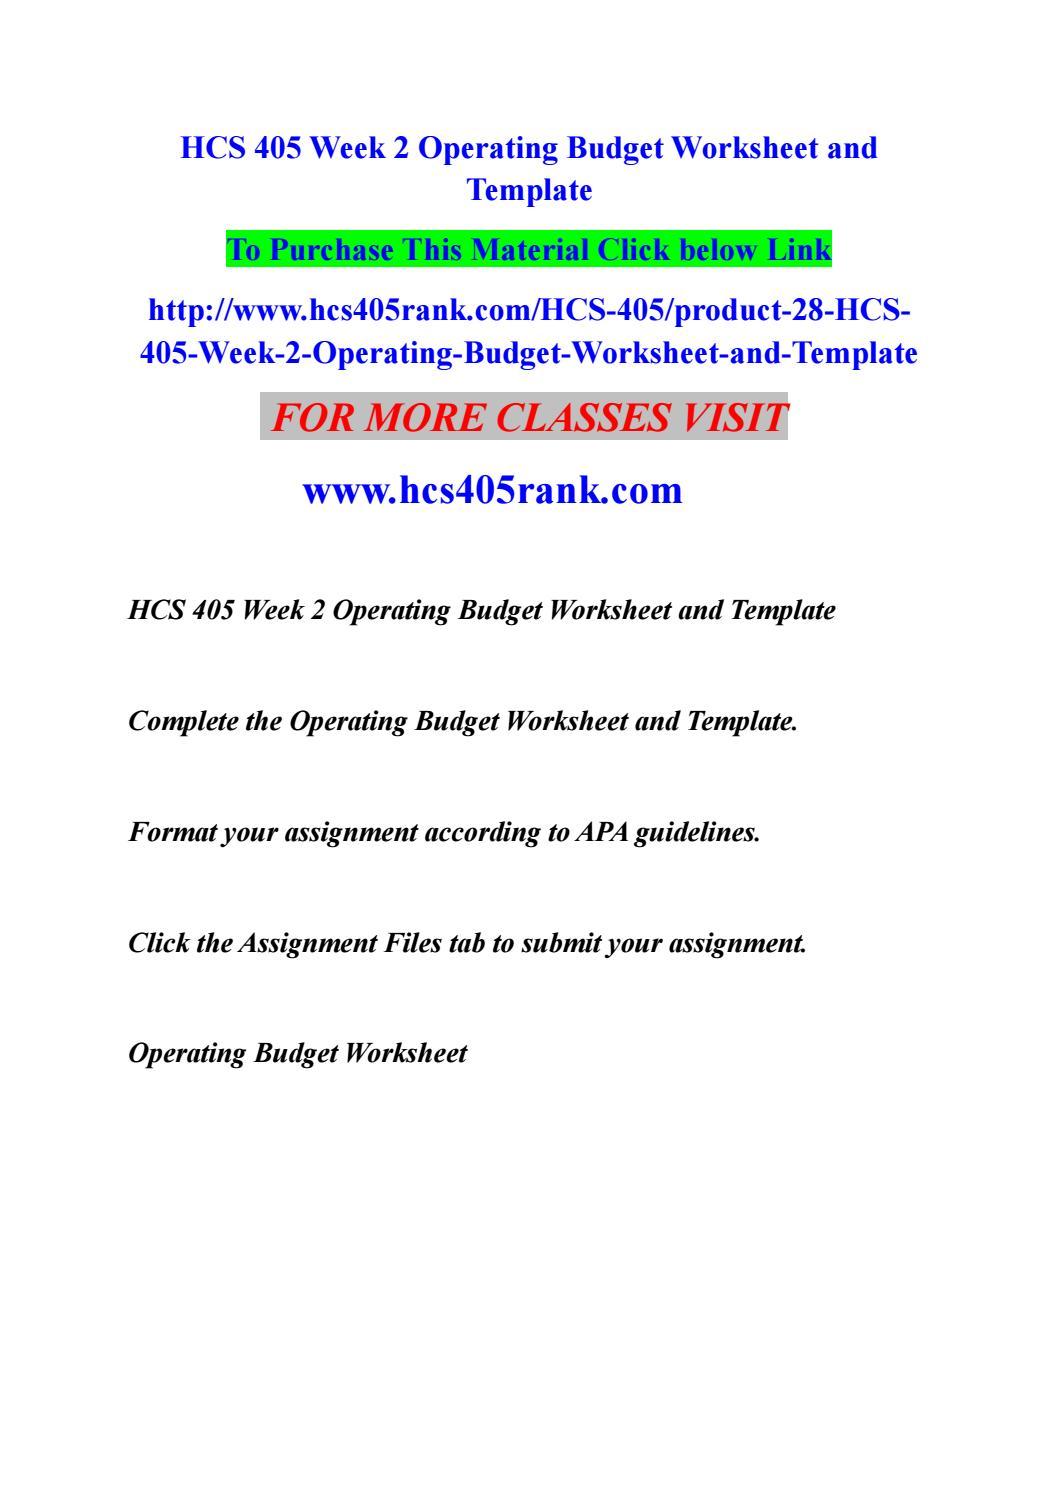 Hcs 405 Week 2 Operating Budget Worksheet And Template By Deva5p Issuu